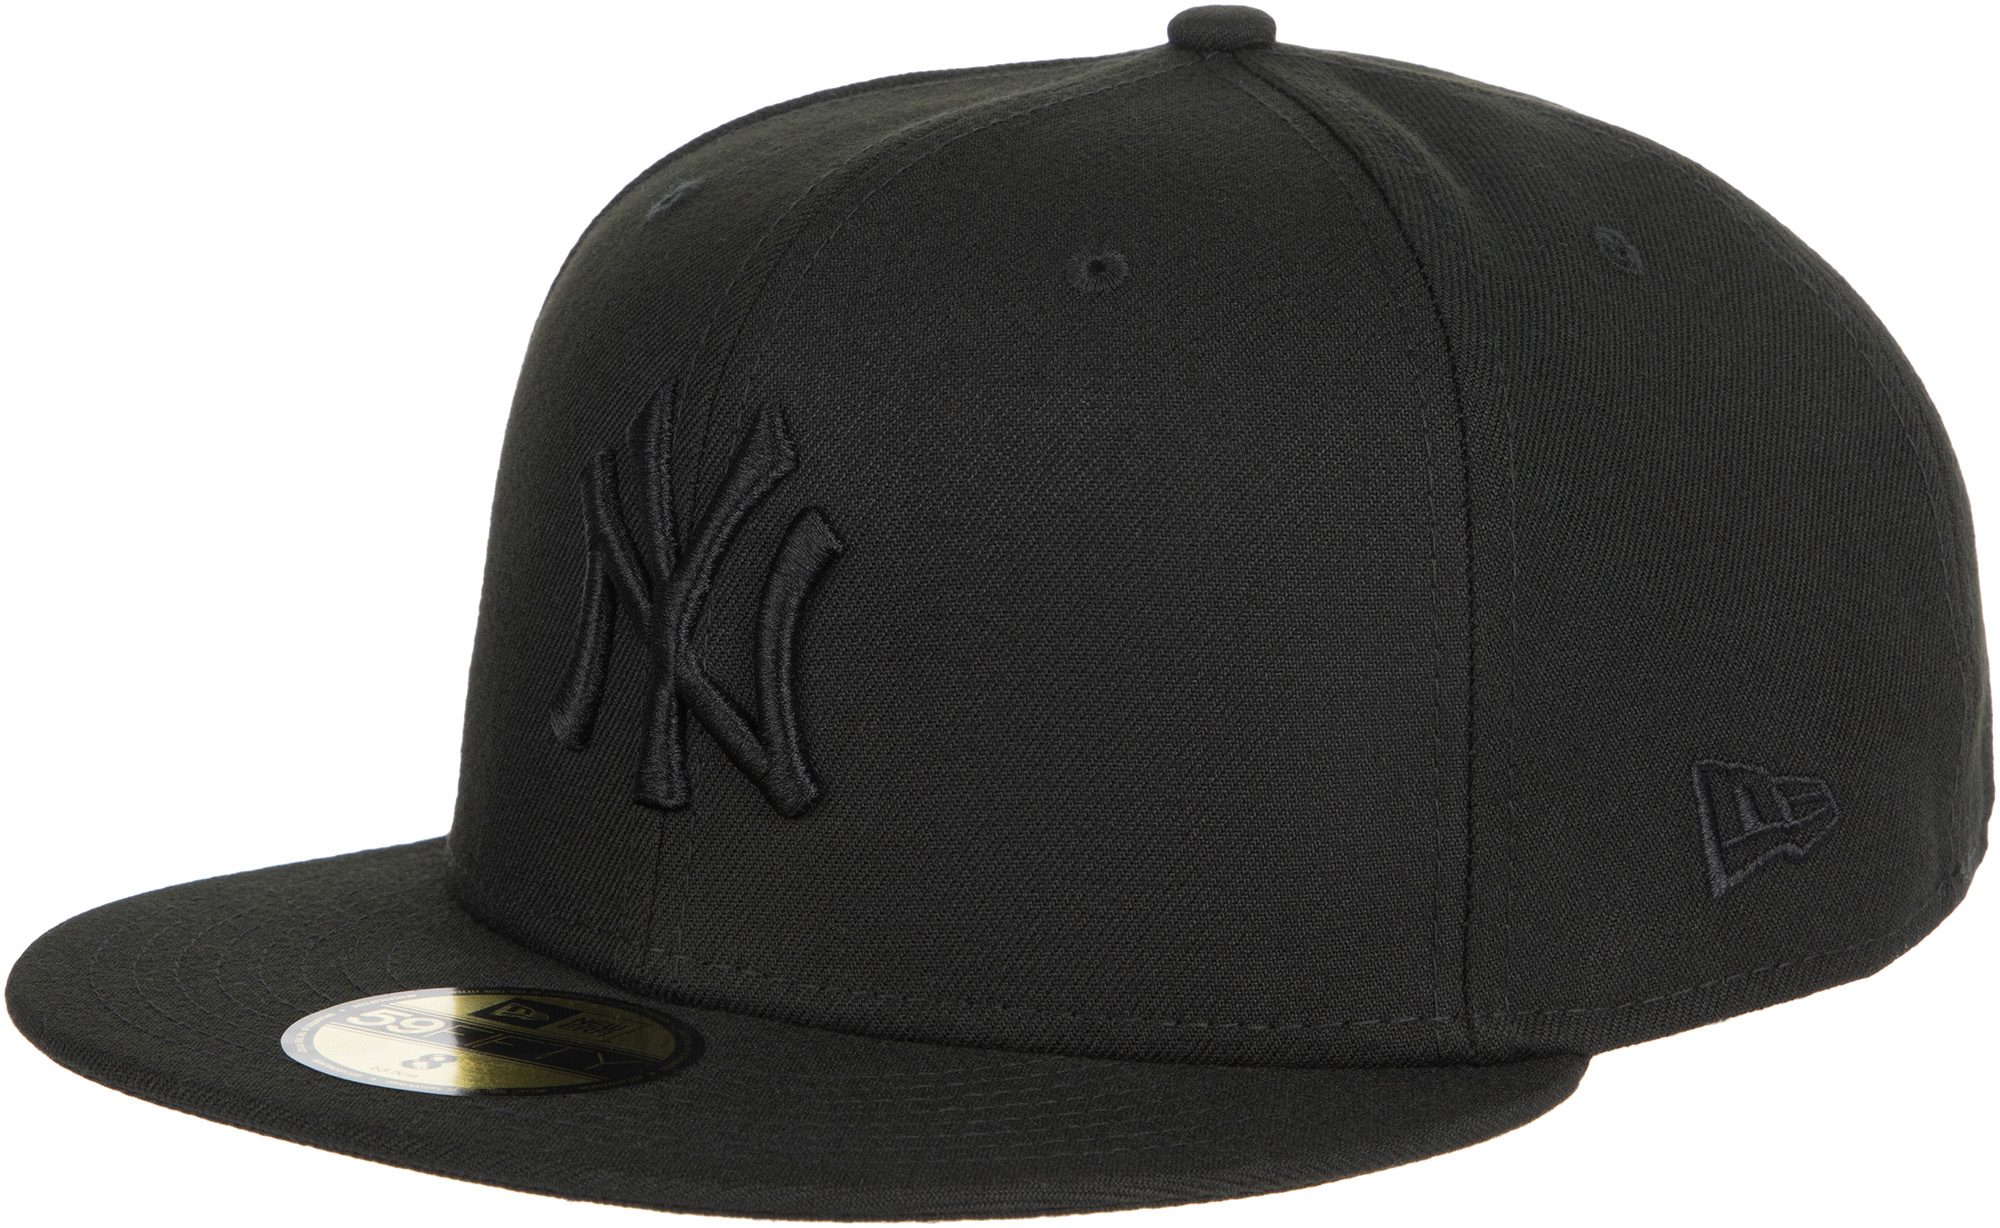 New Era Бейсболка New Era Black On Black NY Yankees, размер 56 бейсболка пятипанелька huf oxford volley black